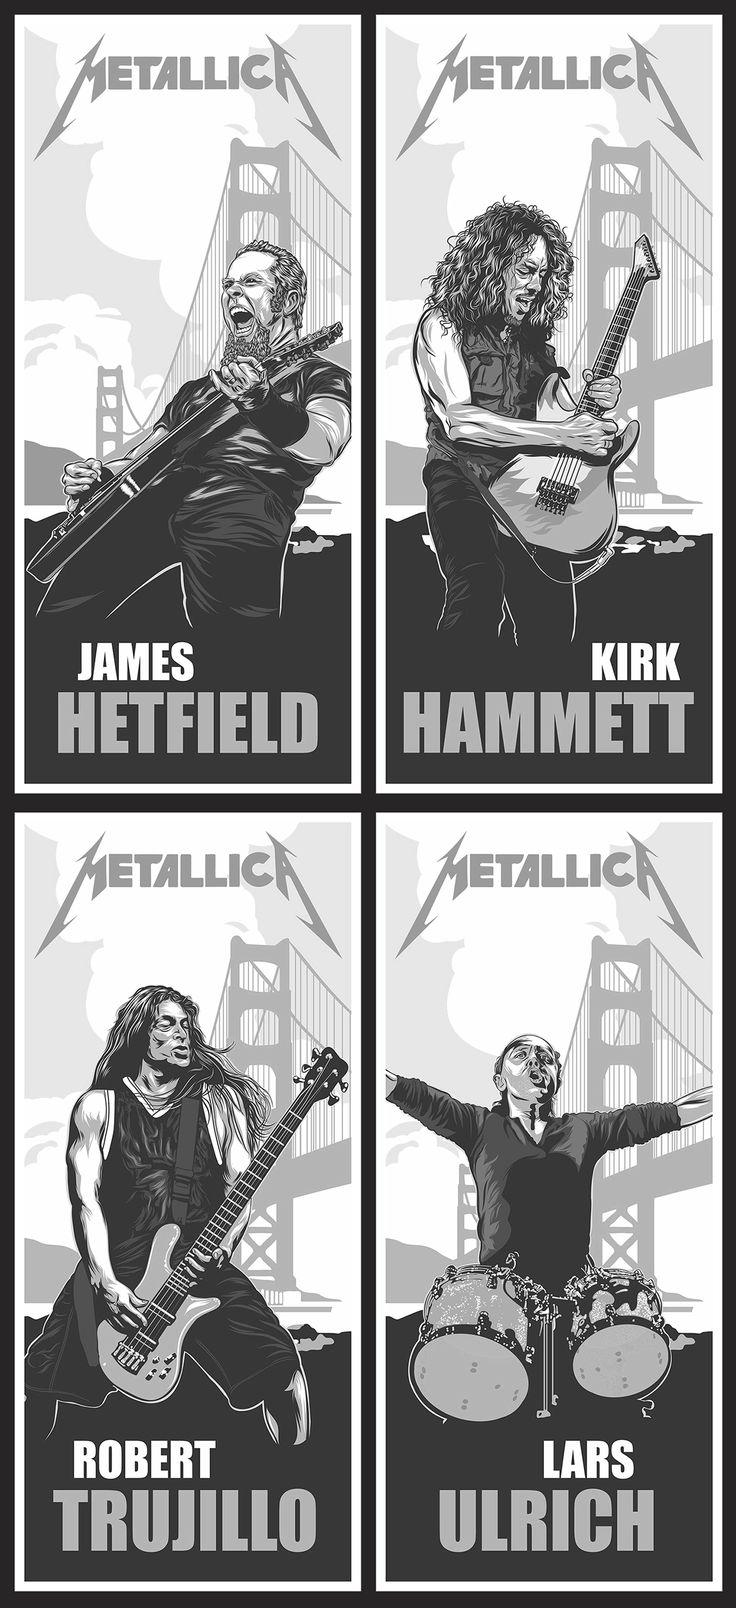 El equipo Metallica.